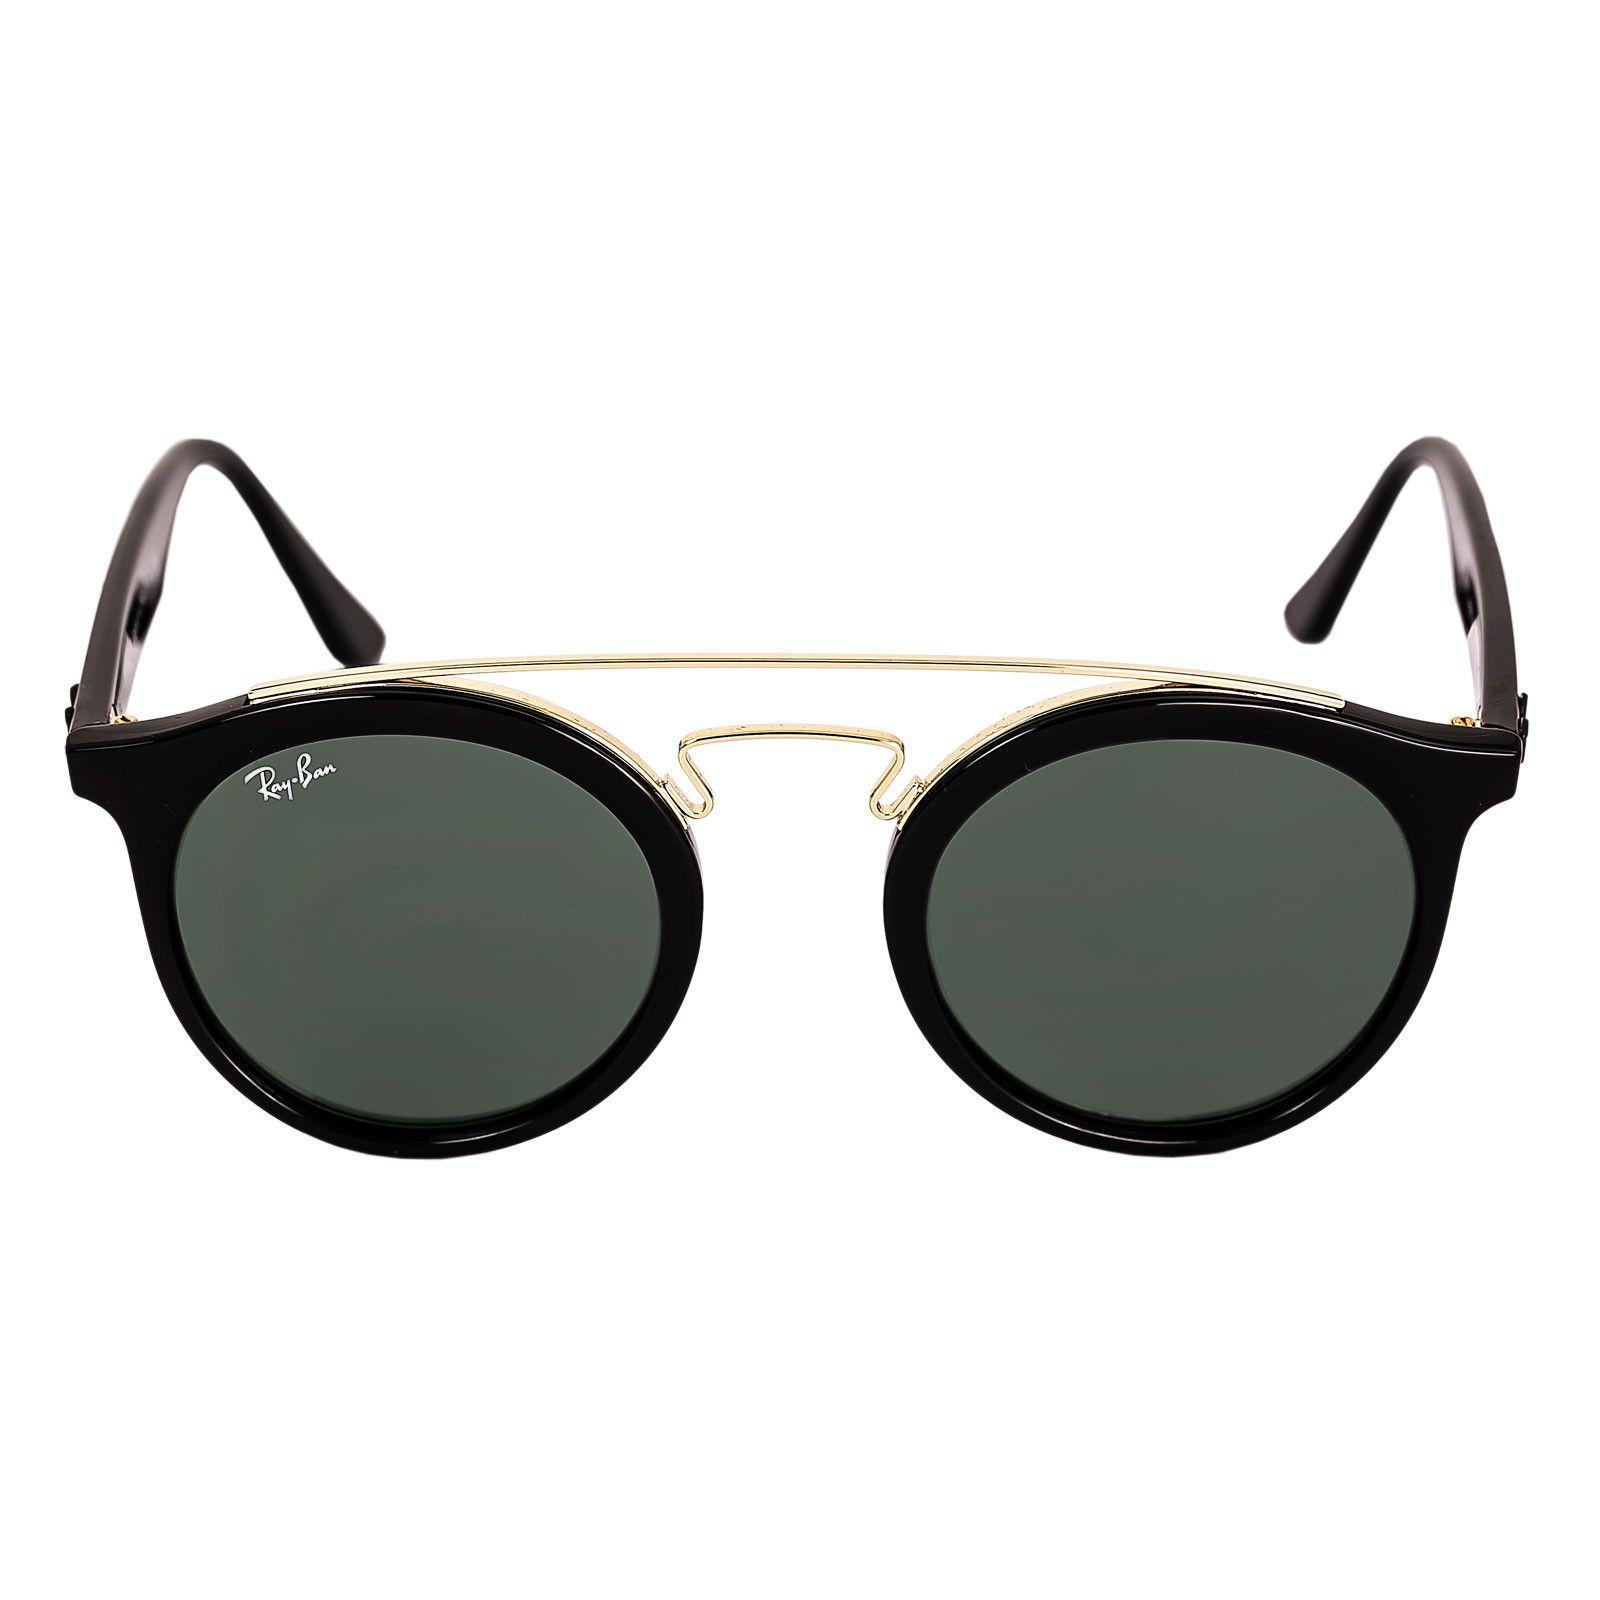 d80f71c1d6 Ray-Ban RB 4256 46 Women s Gatsby I Round Green Classic Lenses Black  Propionate   Gold Metal Frame Sunglasses